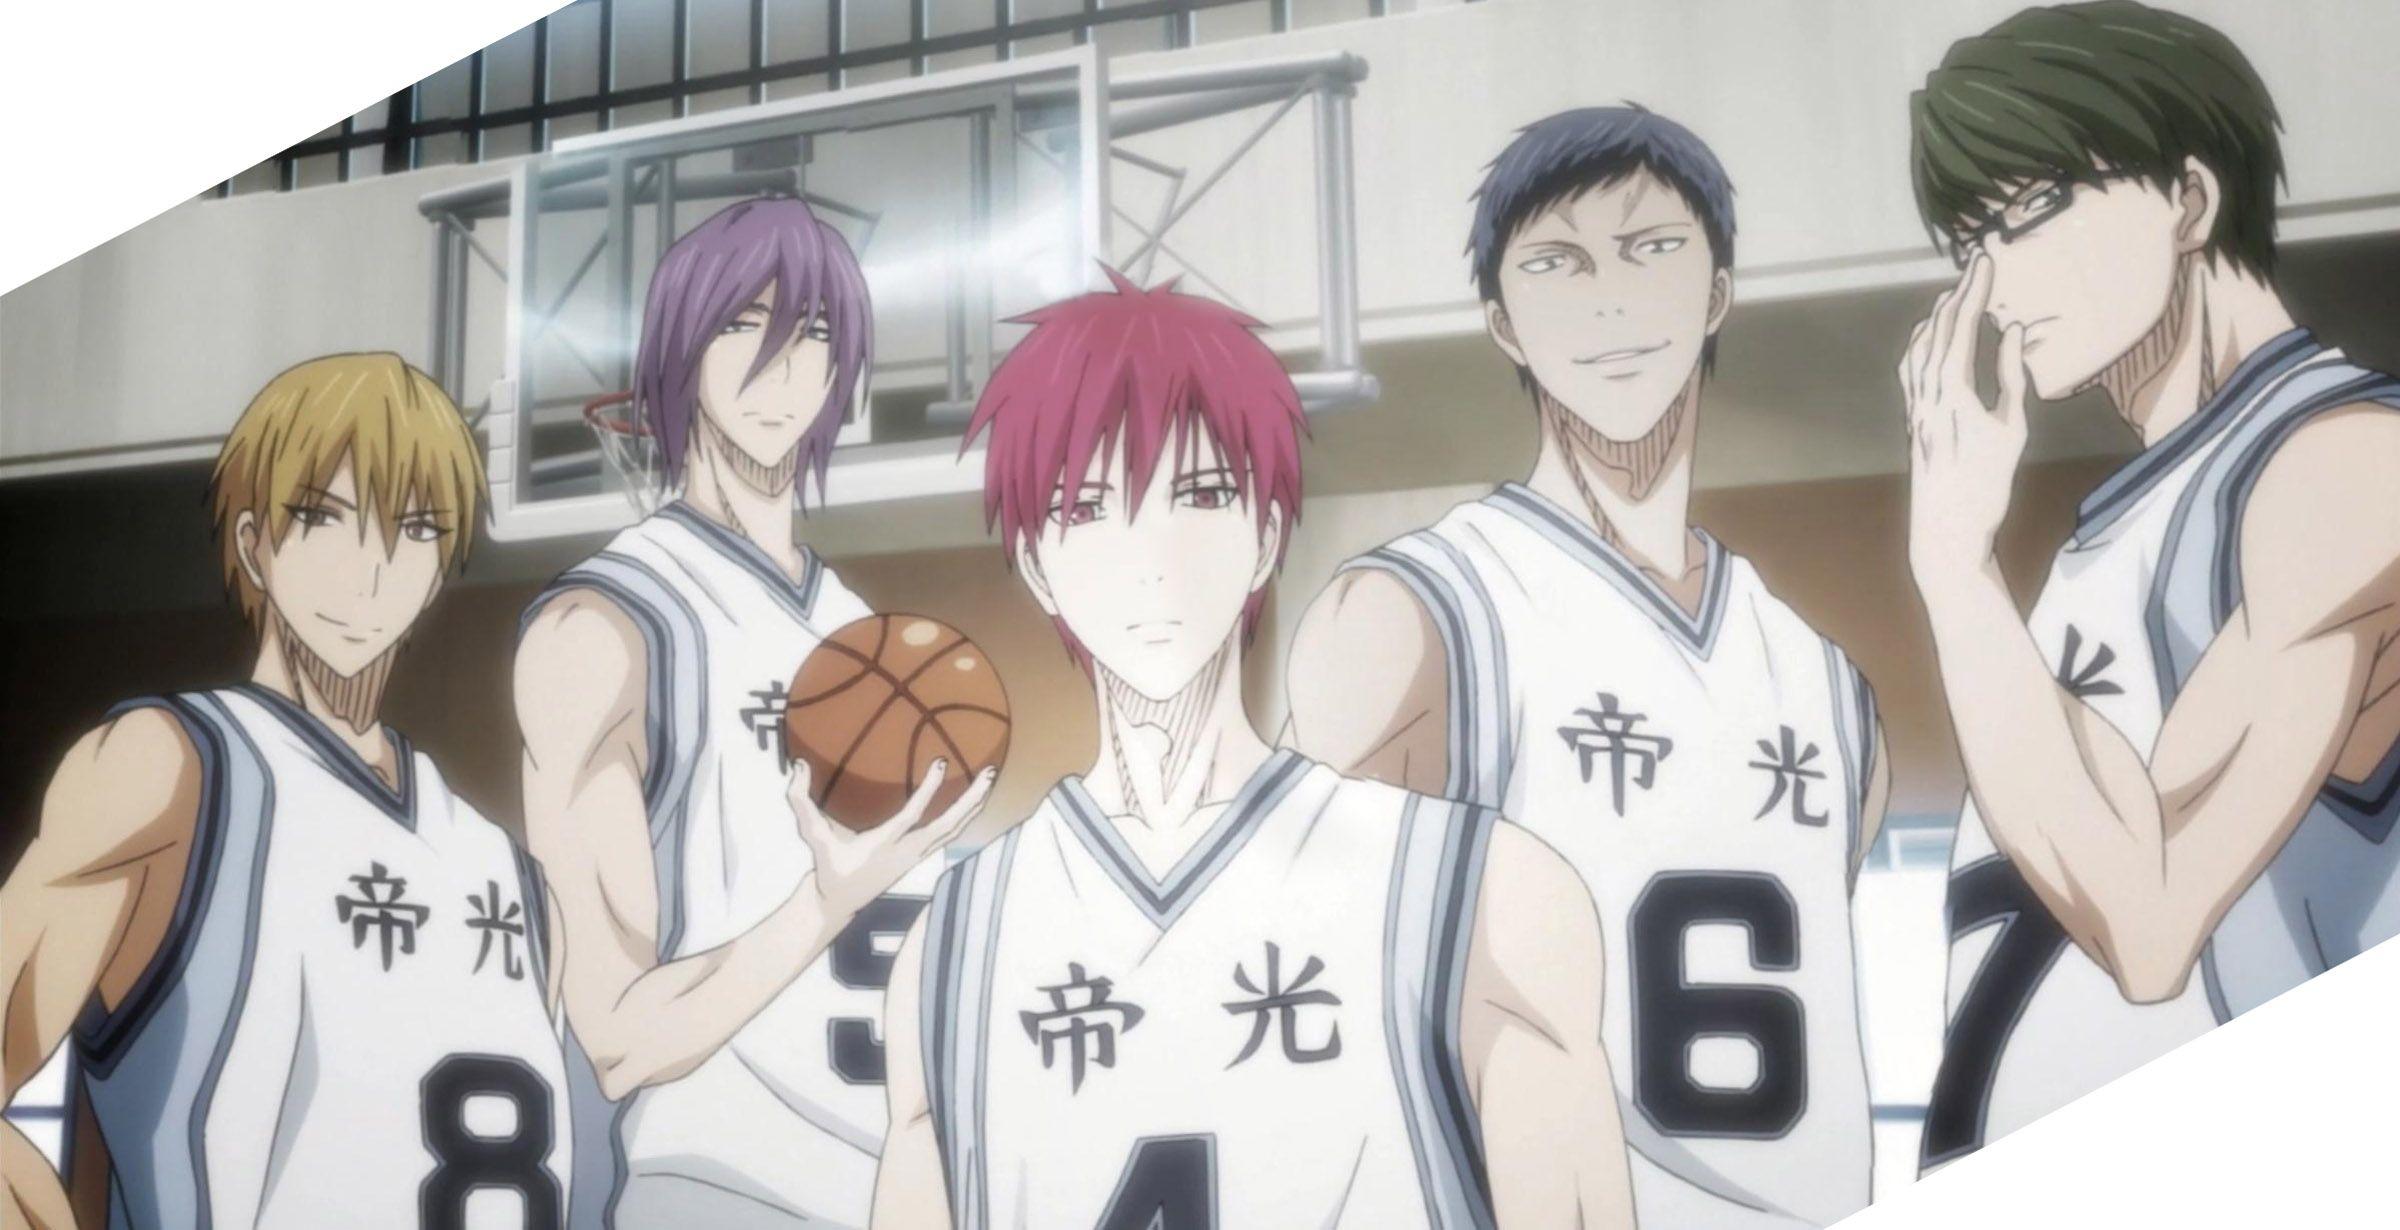 Basketball Kuroko No BasketHd WallpaperCar